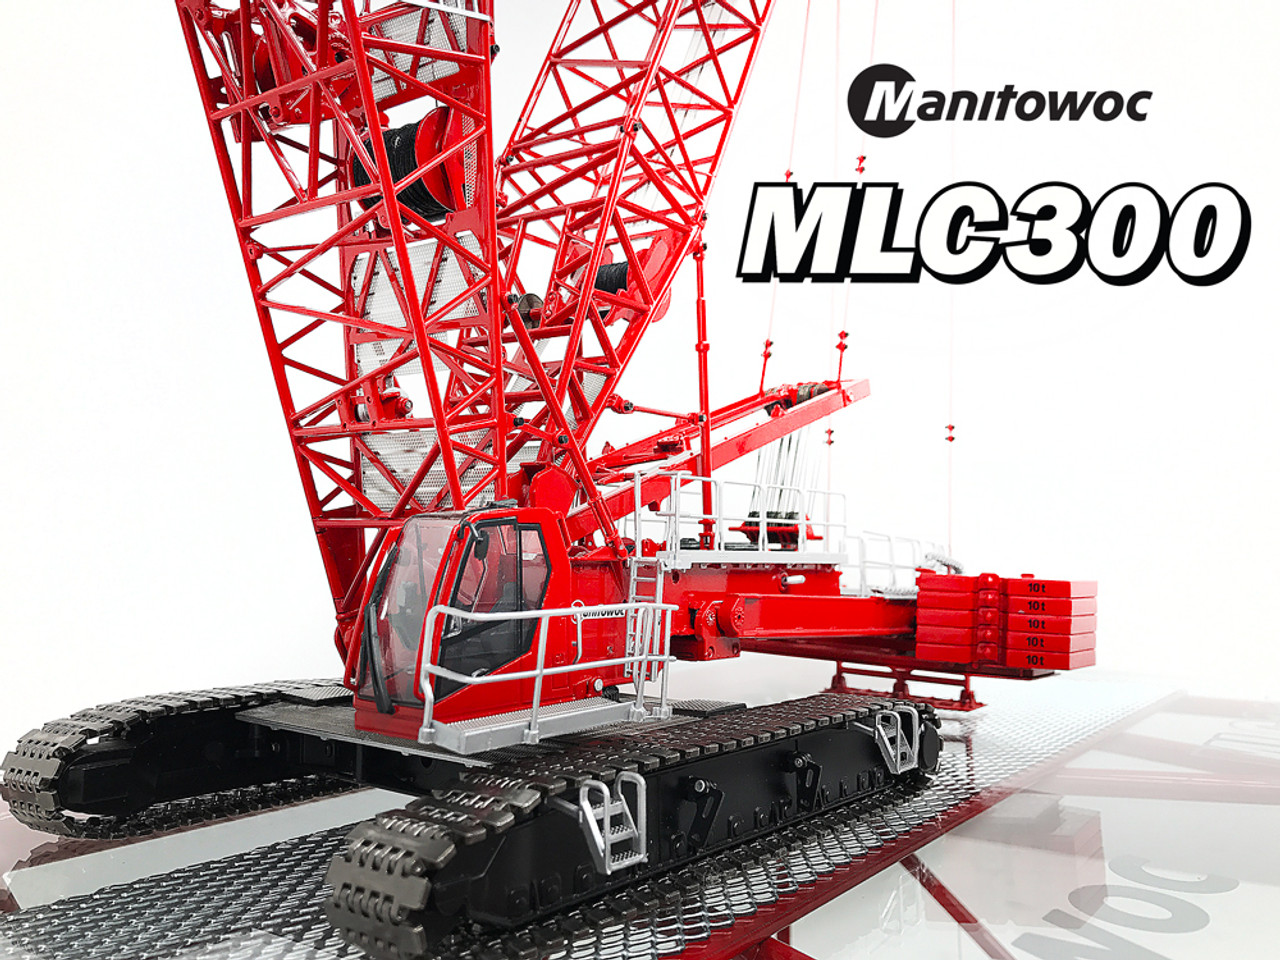 1 50 Manitowoc Mlc300 Crawler Crane Diecast Scale Model